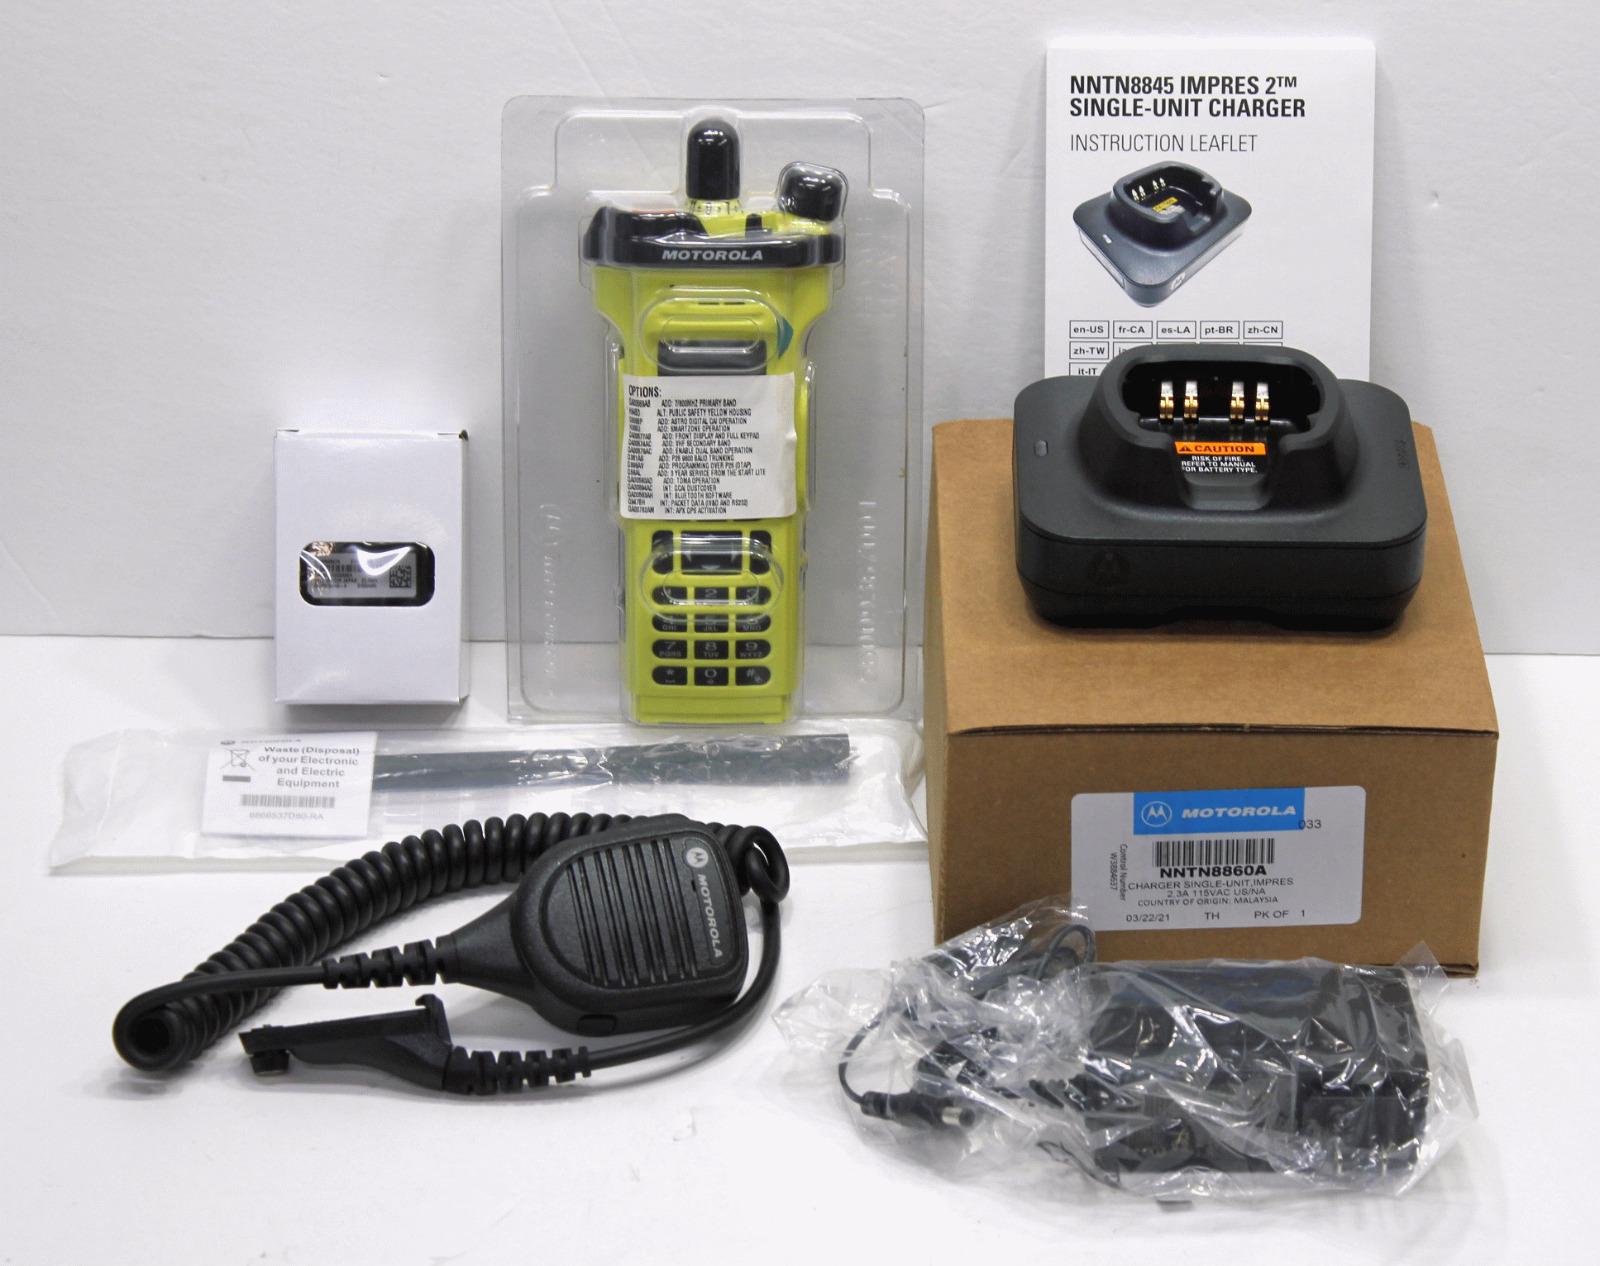 New NEW IN BOX MOTOROLA APX7000XE APX 700/800 VHF 136-174 MHZ DIGITAL RADIO P25 TDMA.